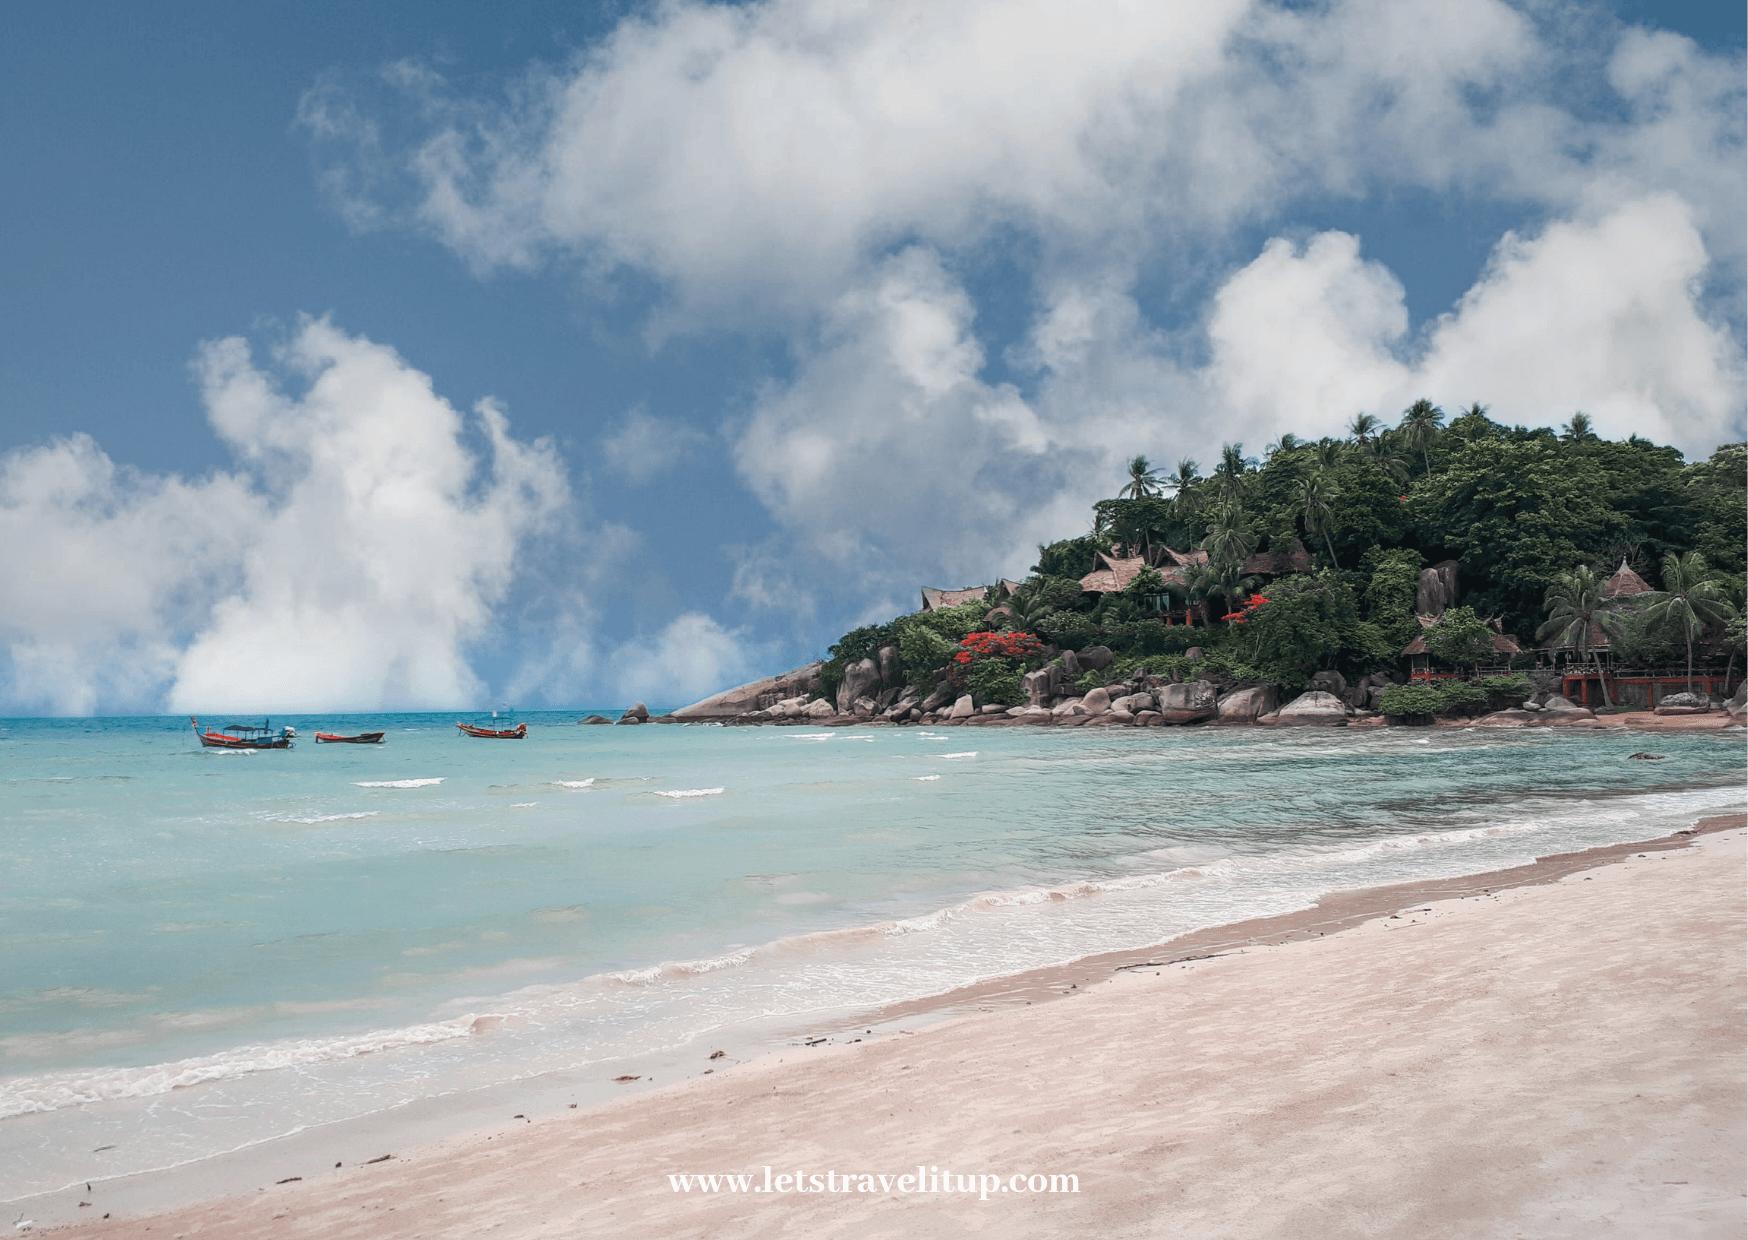 Sairee beach is the main beach on Koh Tao Thailand